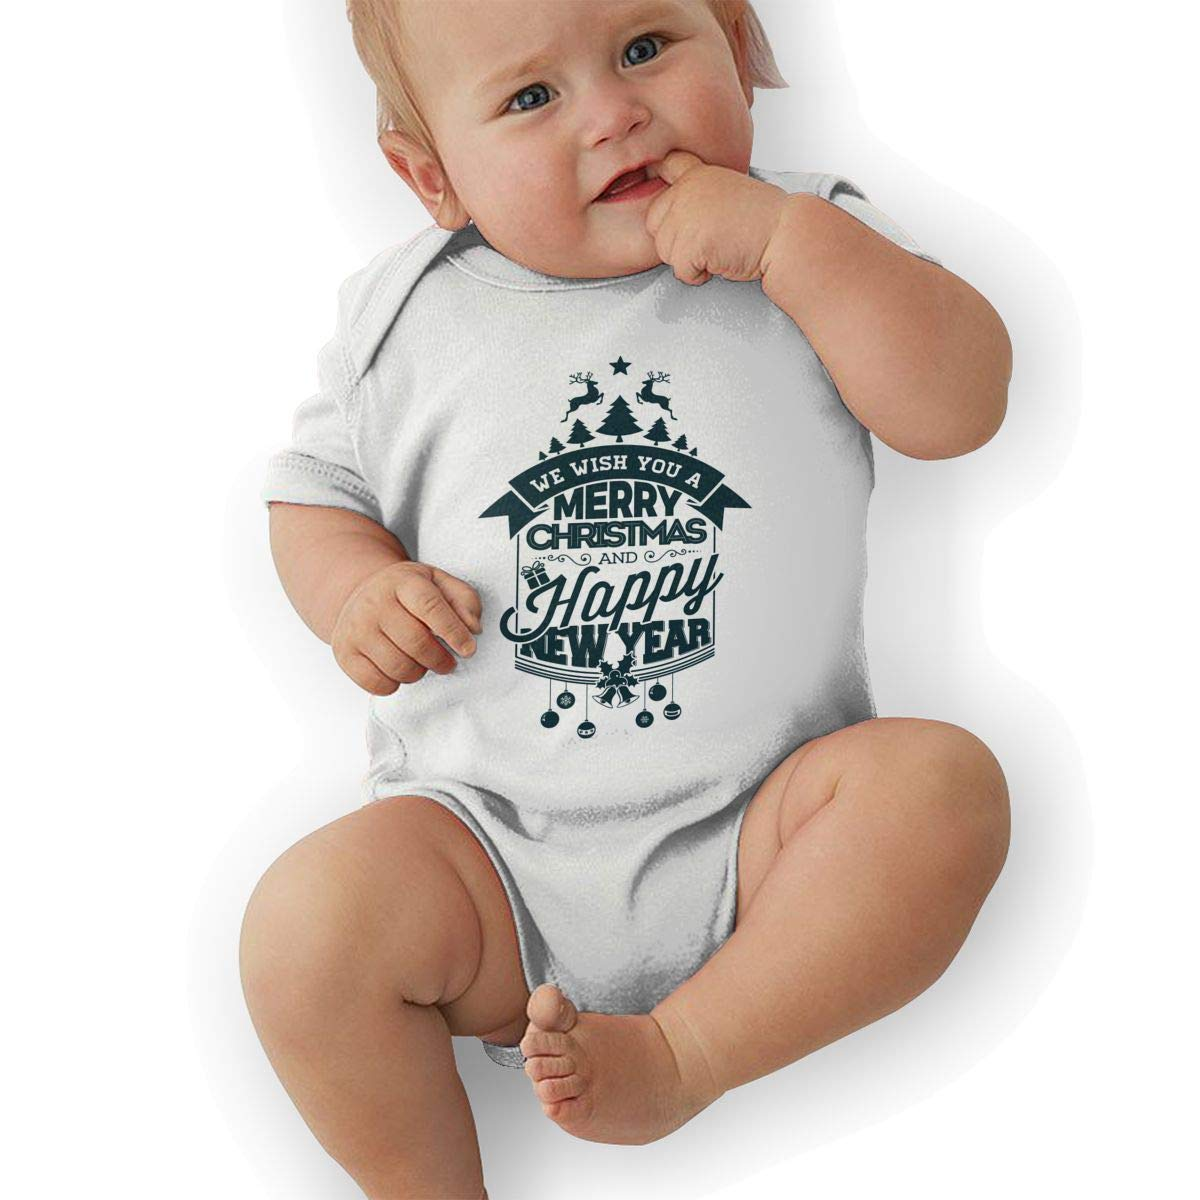 Infant Baby Boys Bodysuit Short-Sleeve Onesie Merry Christmas New Year Print Jumpsuit Autumn Pajamas